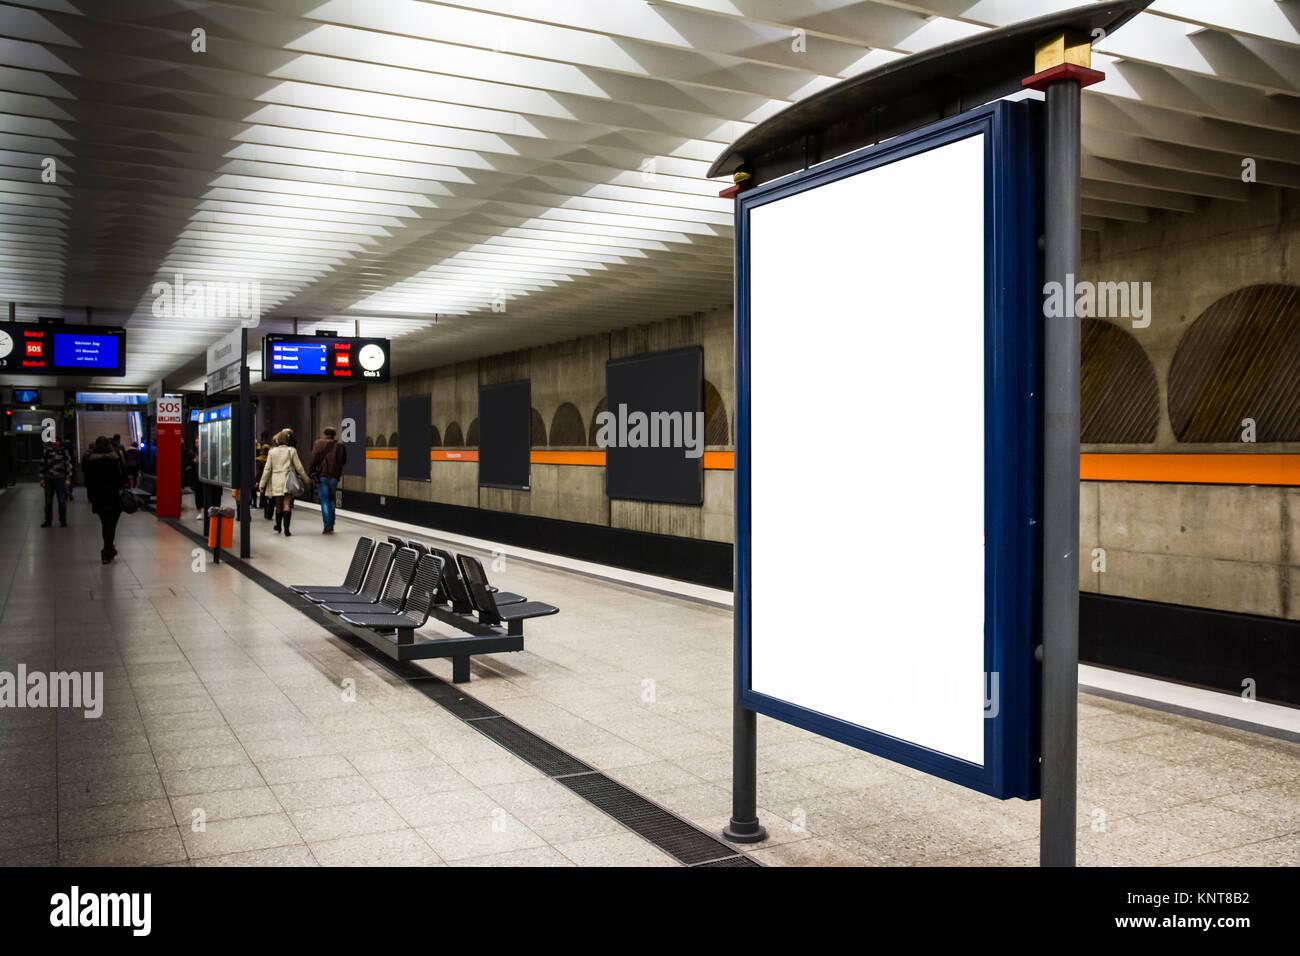 Blank Advertisement Template Subway Underground Bench Munich City Urban Public Transport Germany Europe Light Indoors Rectangular Large Stock Photo